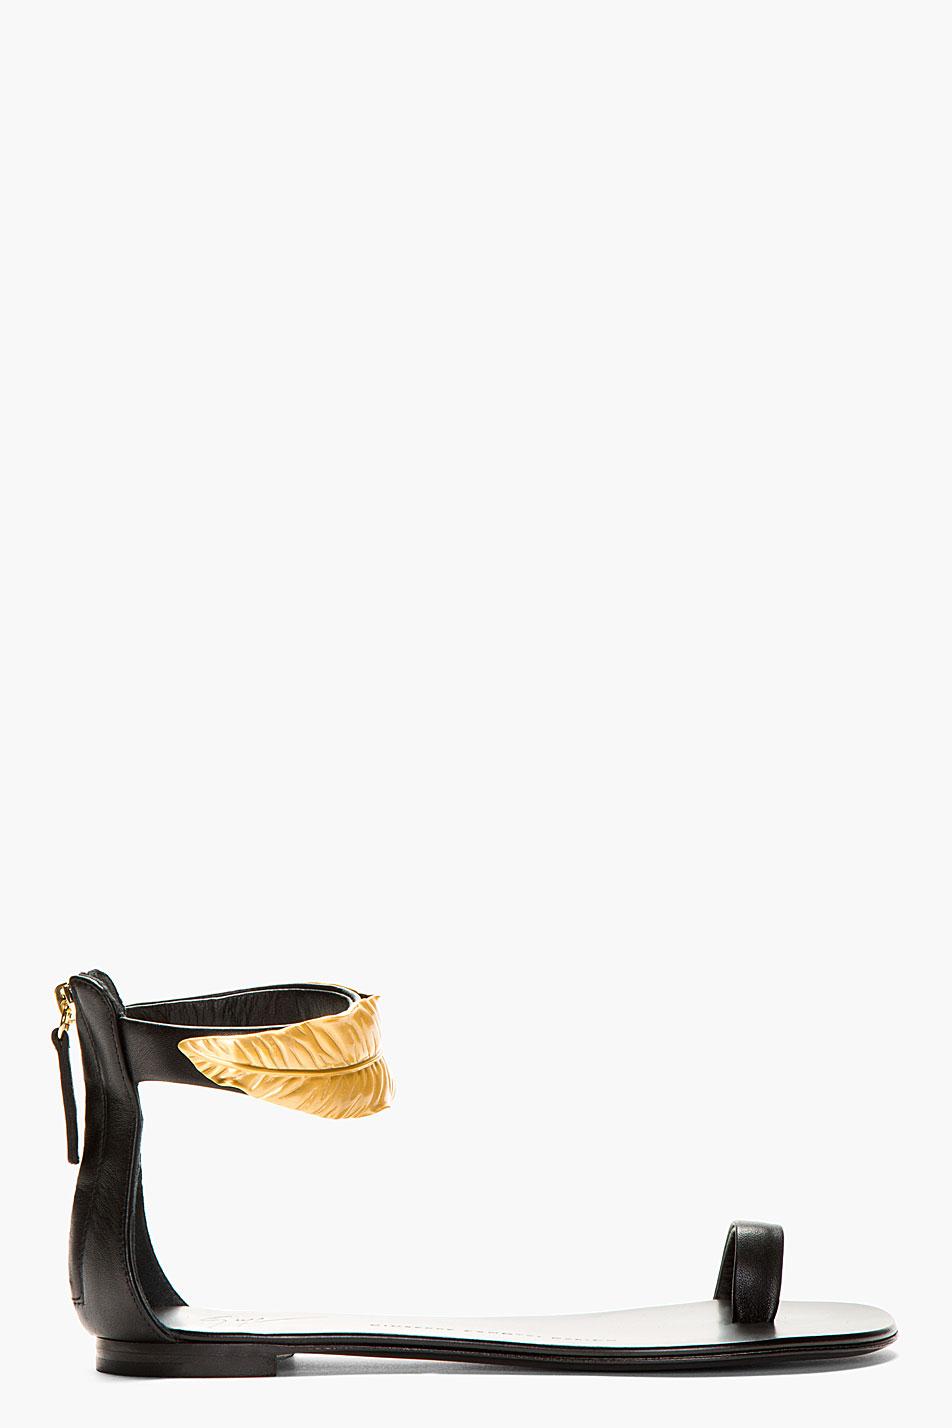 Giuseppe Zanotti Black Nuvorock Gold Leaf Flat Sandals In